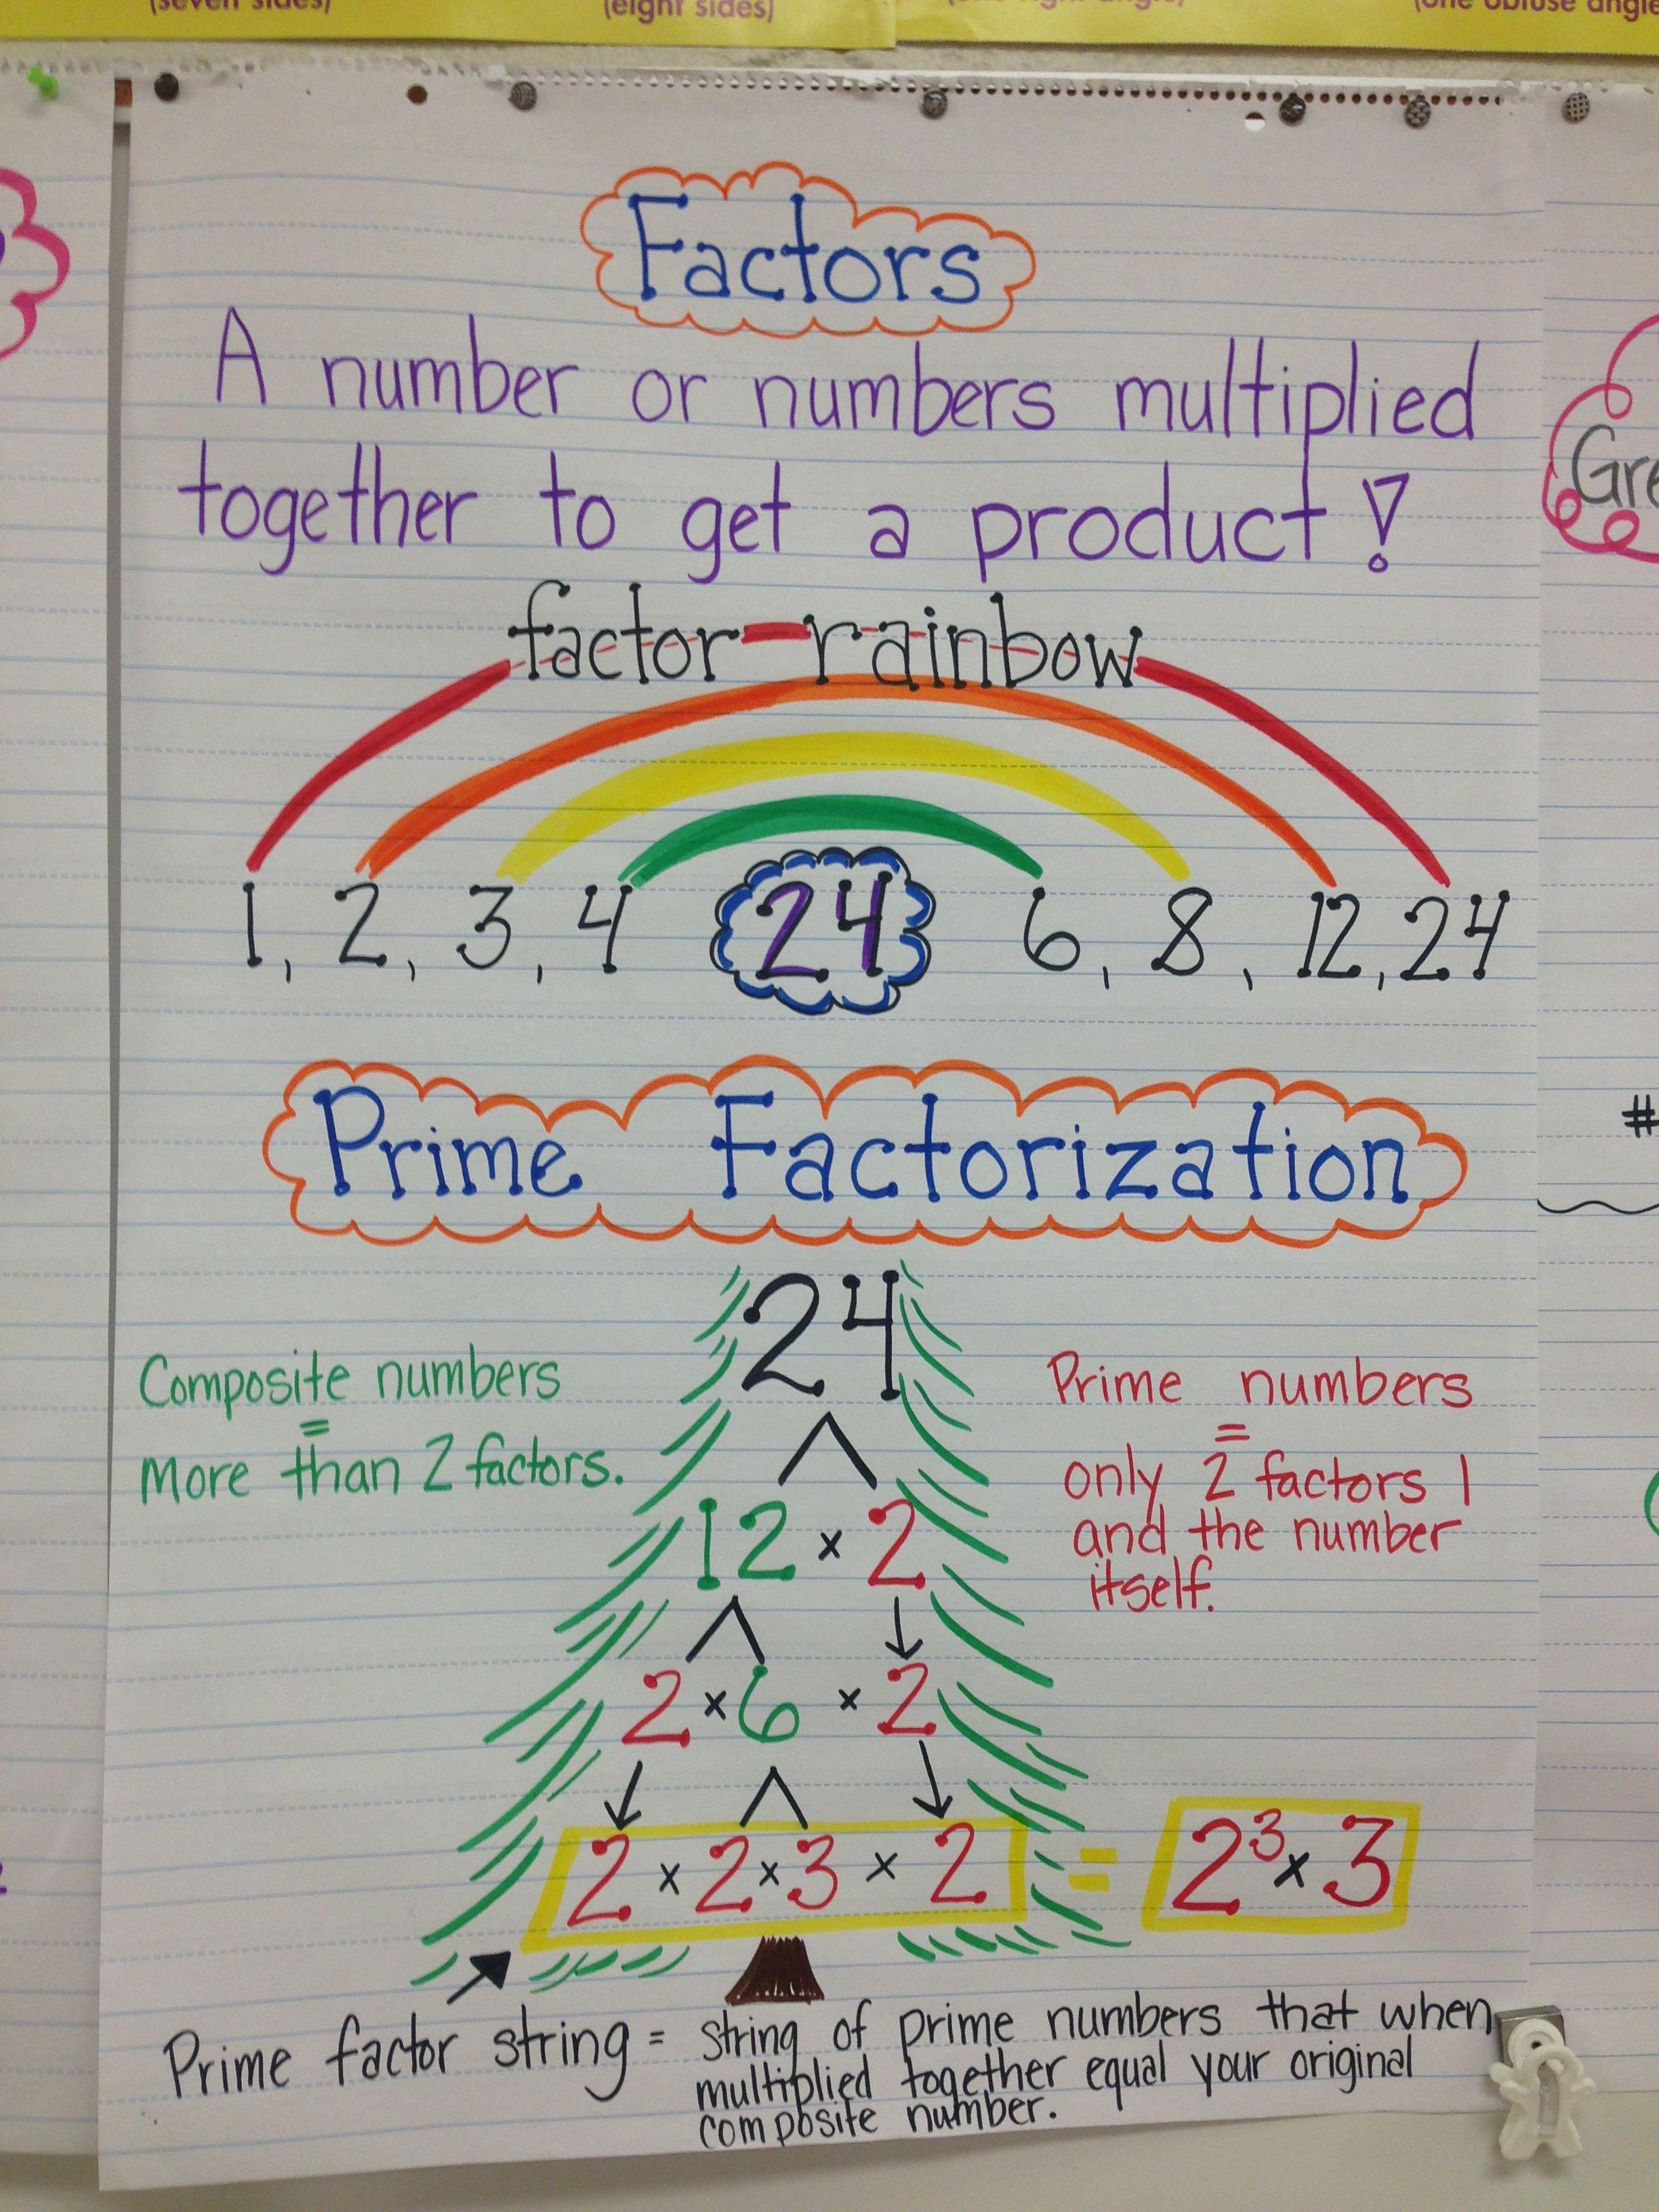 Factor Rainbow   Classroom   Pinterest   Trees, Math and Factors